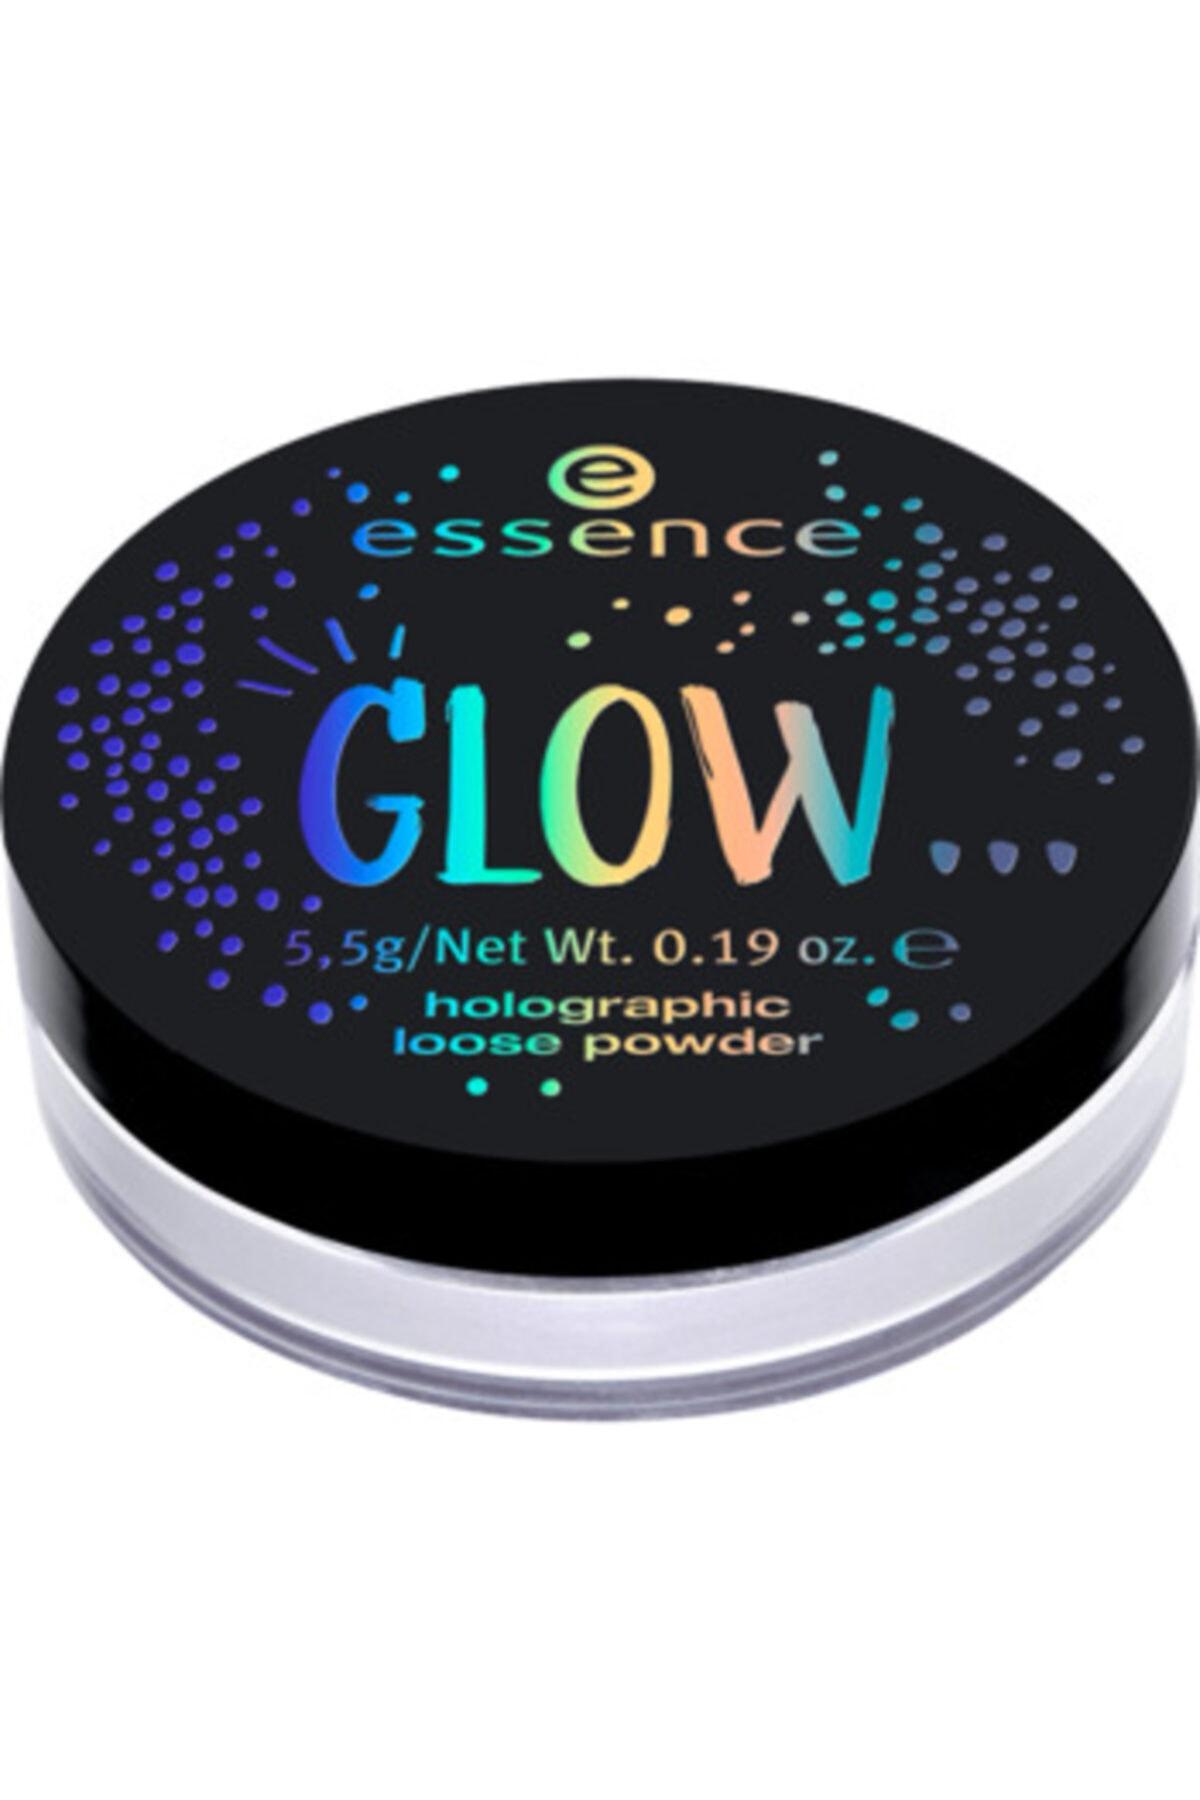 Essence Glow... Holographic Loose Powder 01 1